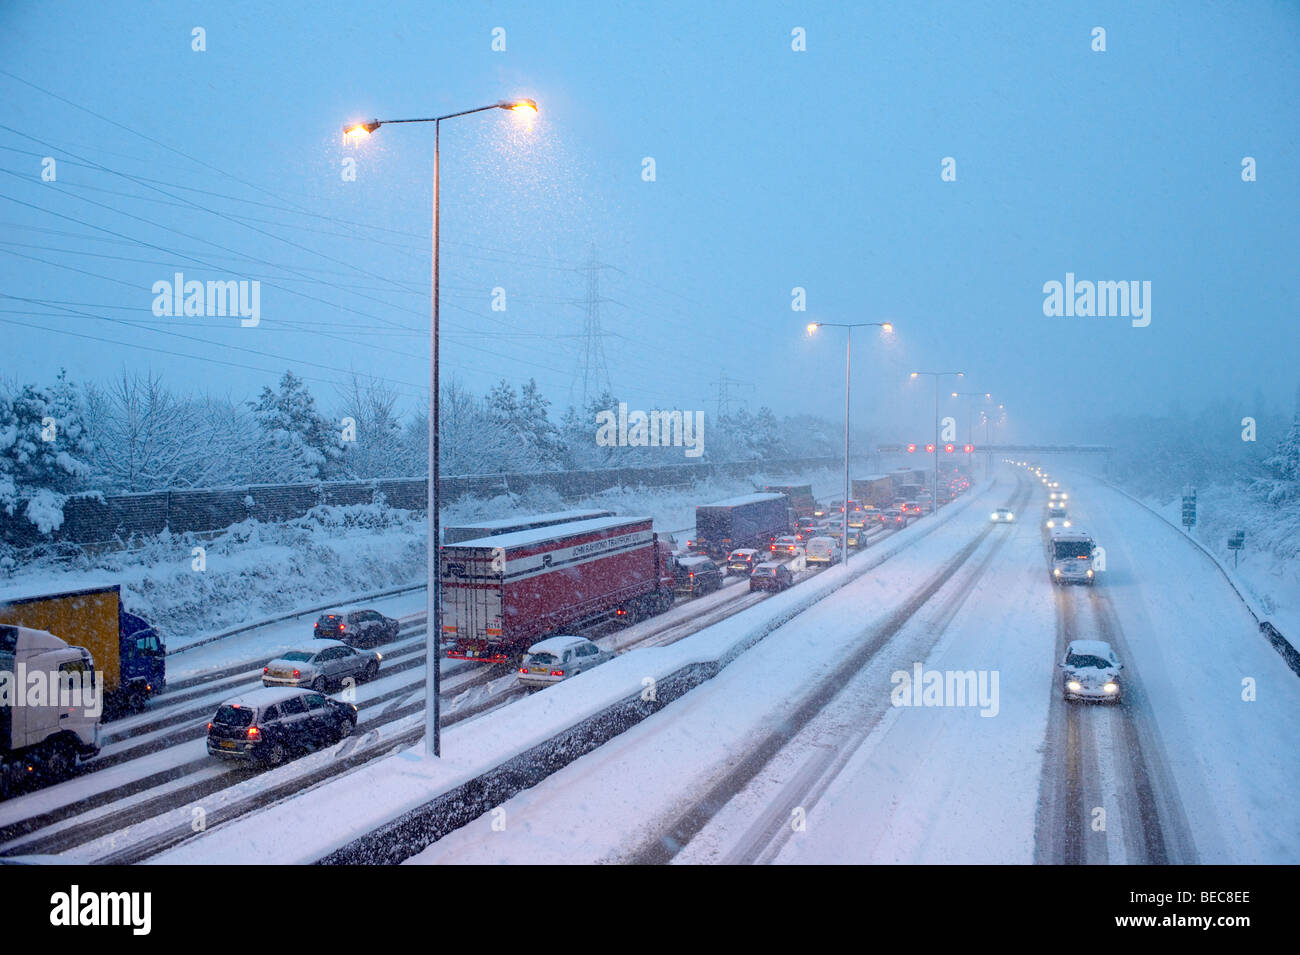 M25 motorway during blizzard, England, Surrey - Stock Image